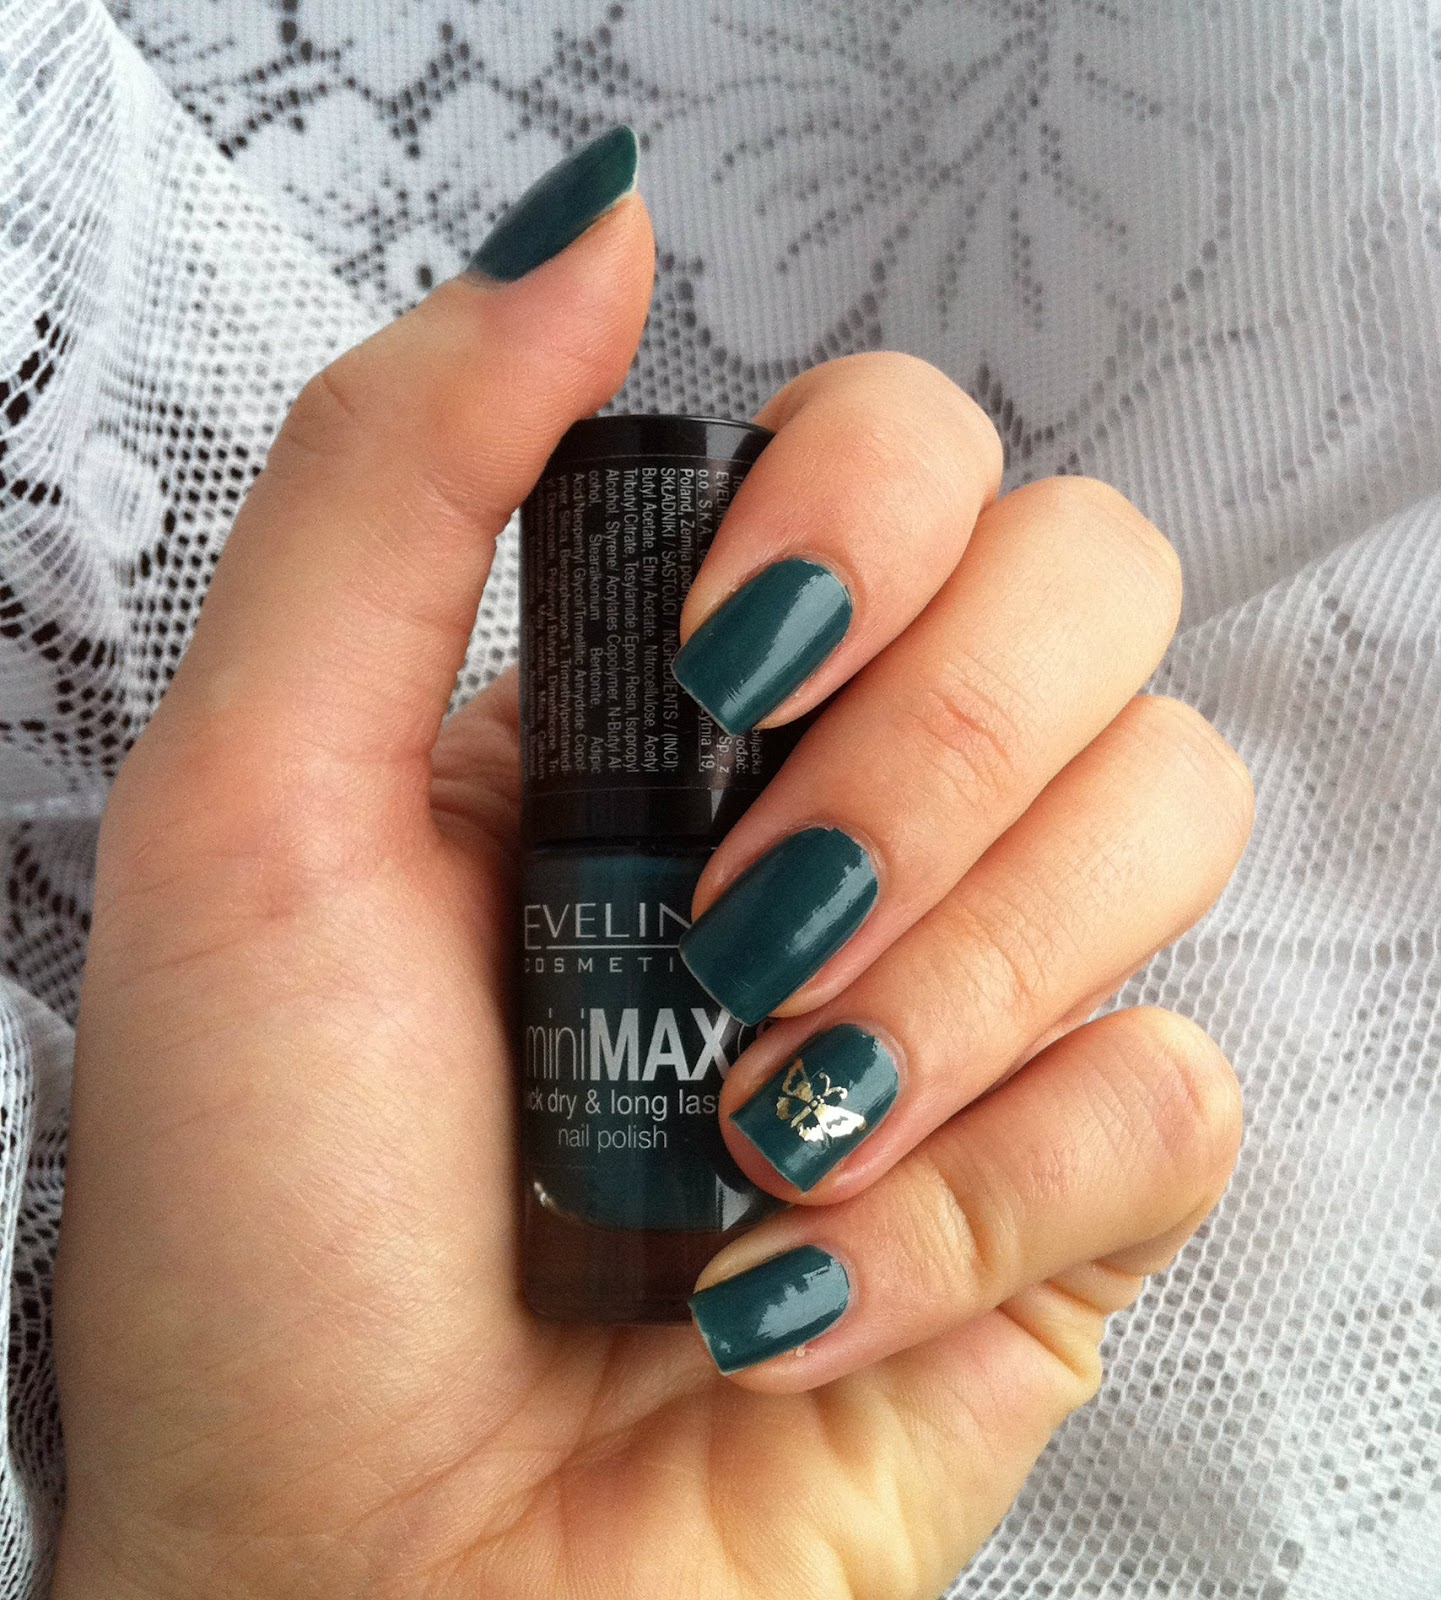 miniMAX nr.843 od Eveline Cosmetics